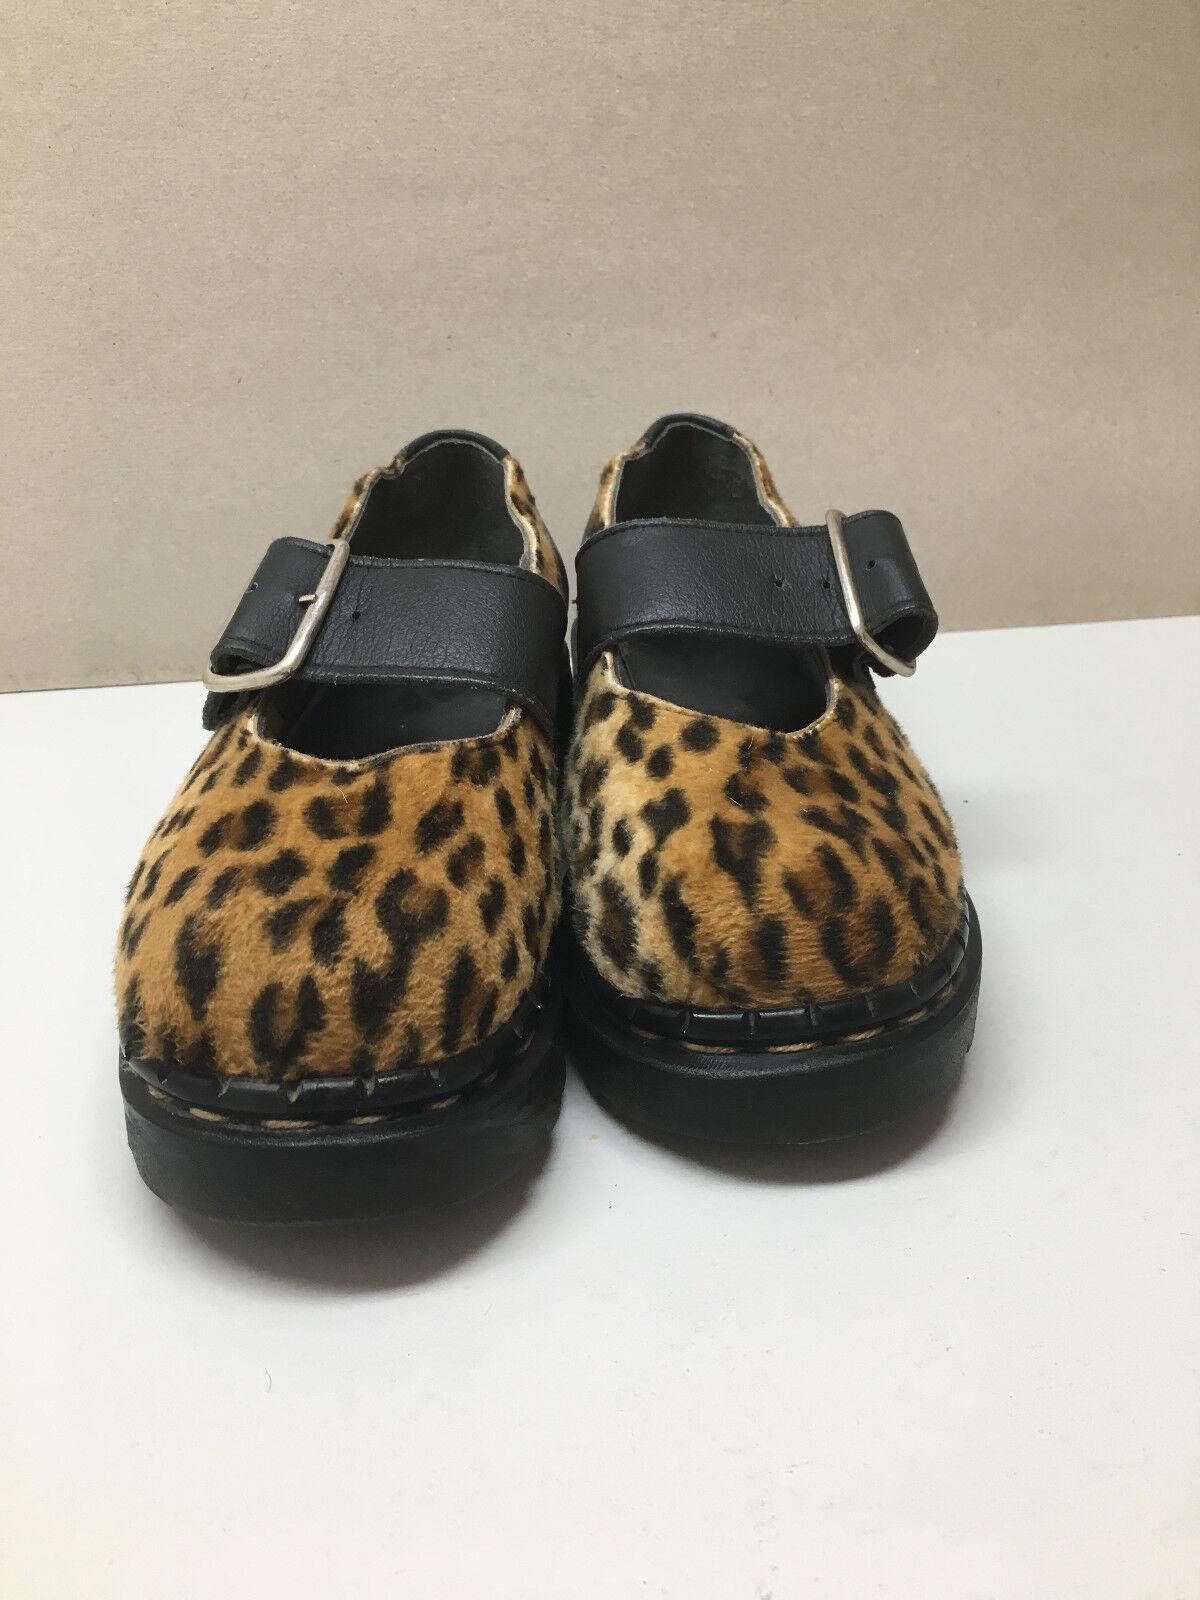 Tredair Leopard Mary Janes 7, GR. 36